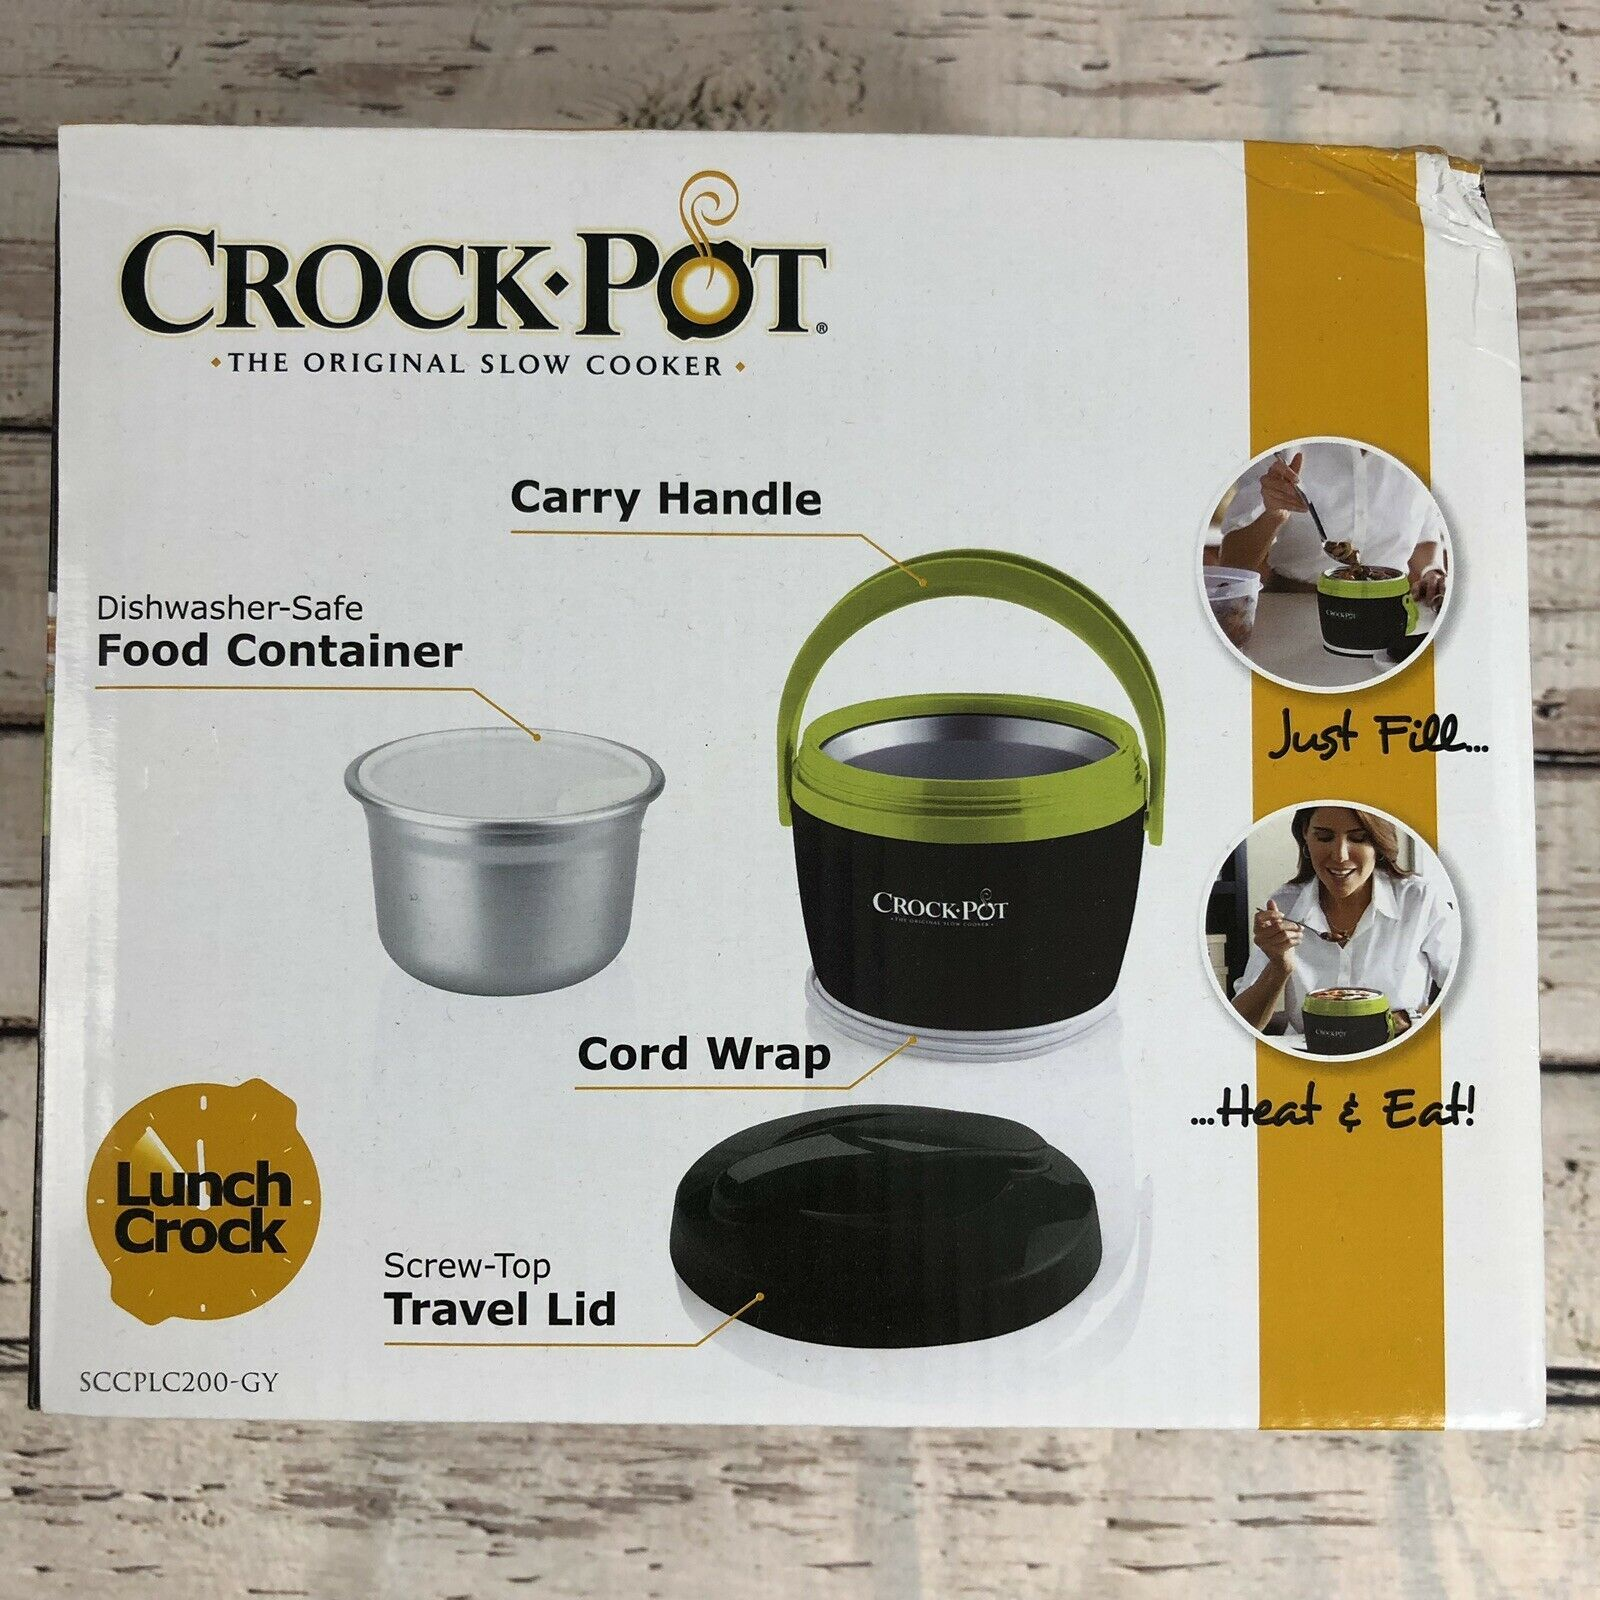 Crock Pot Lunch Crock Food Warmer image 3